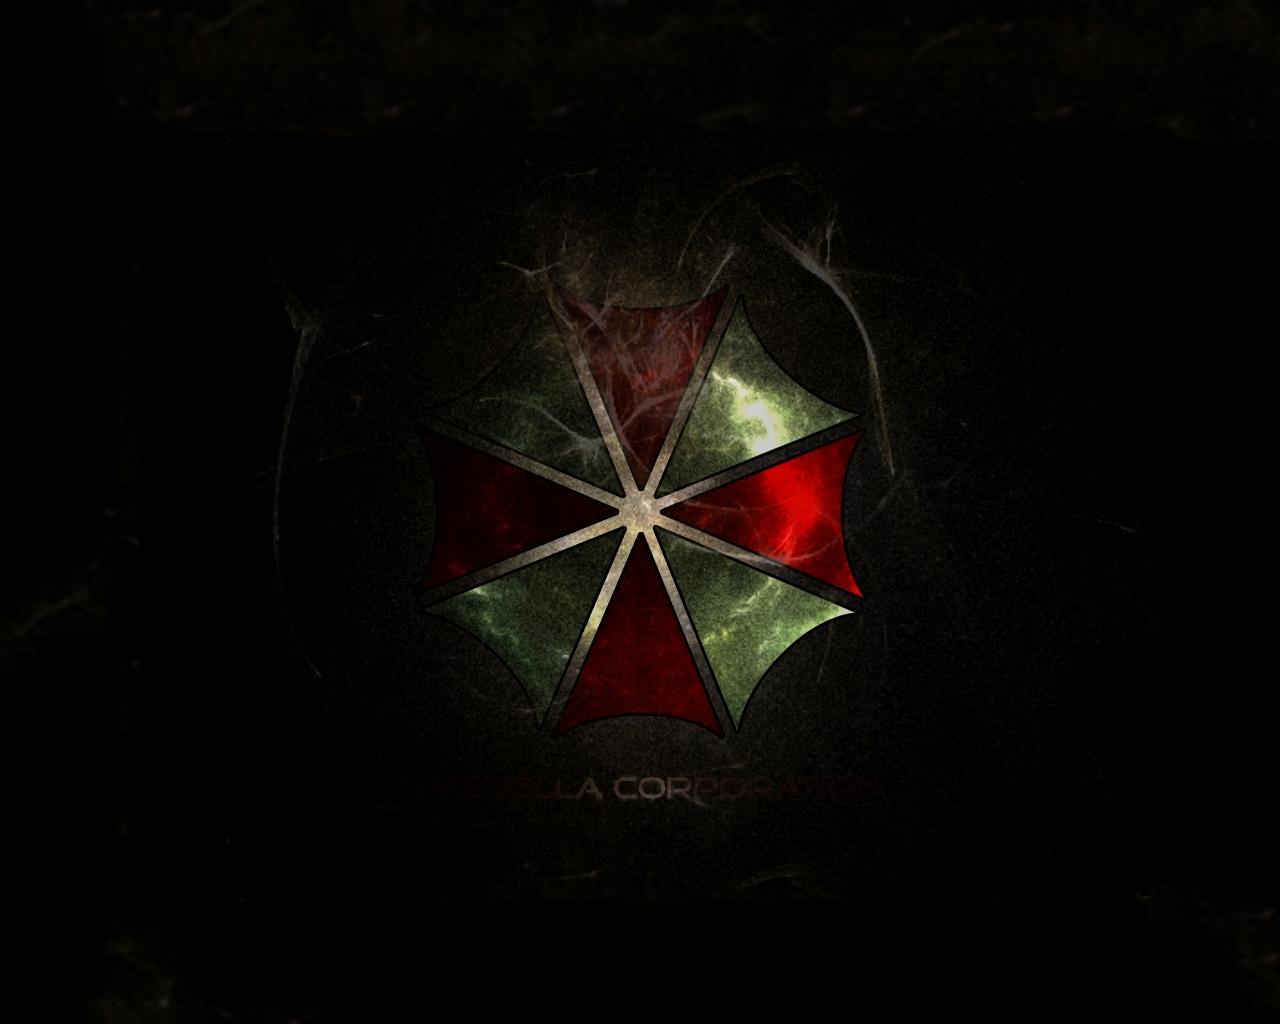 resident evil umbrella corporation title logo symbol wallpaper 1280x1024